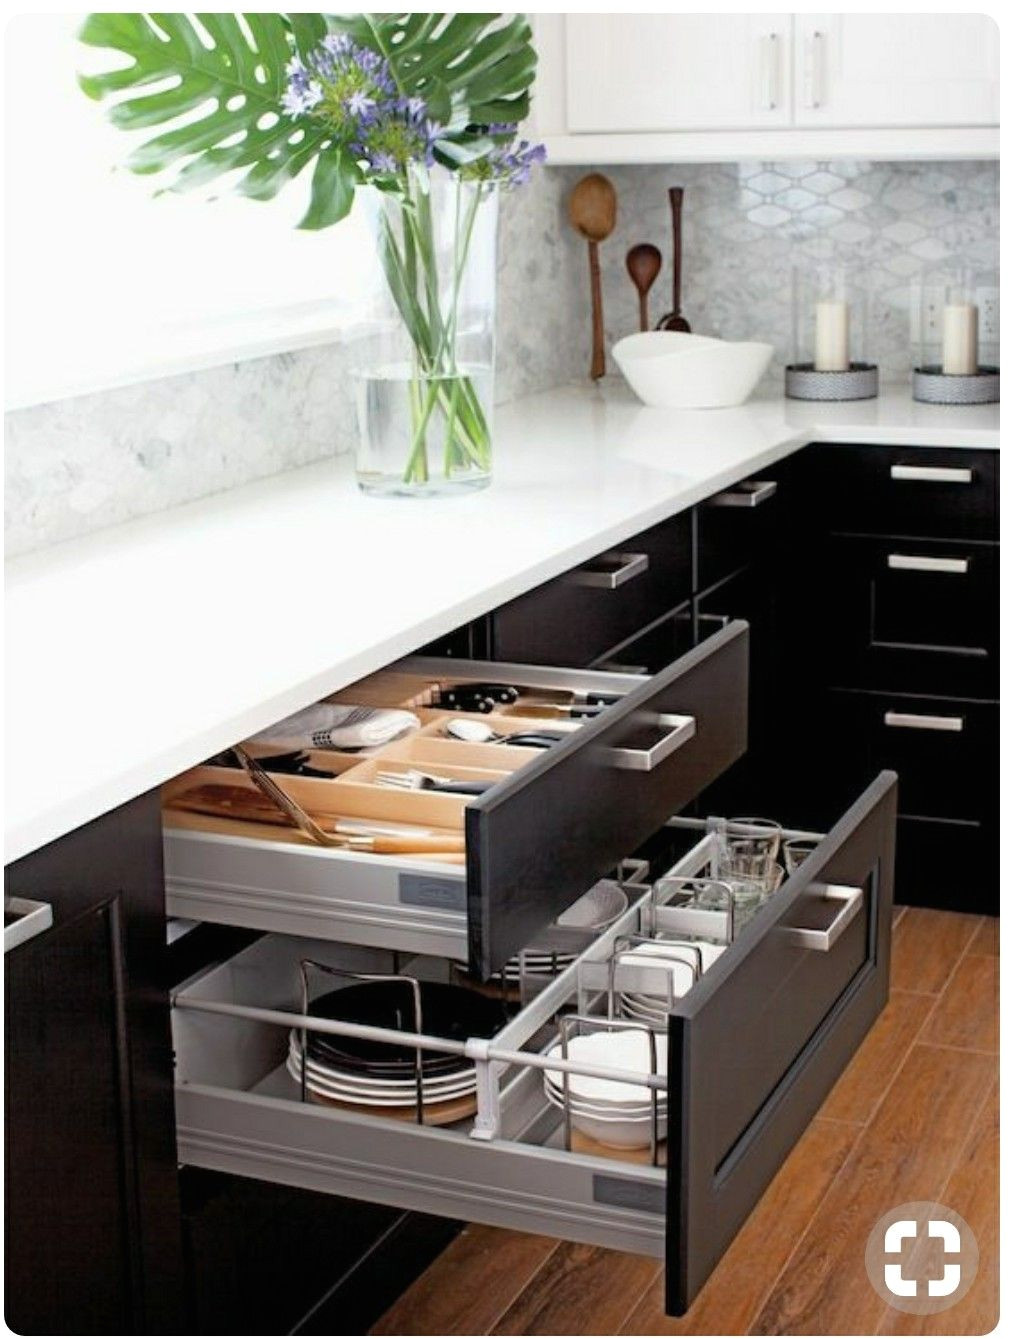 ikea ramsjo and ikea lidingo contemporary kitchen house tweaking